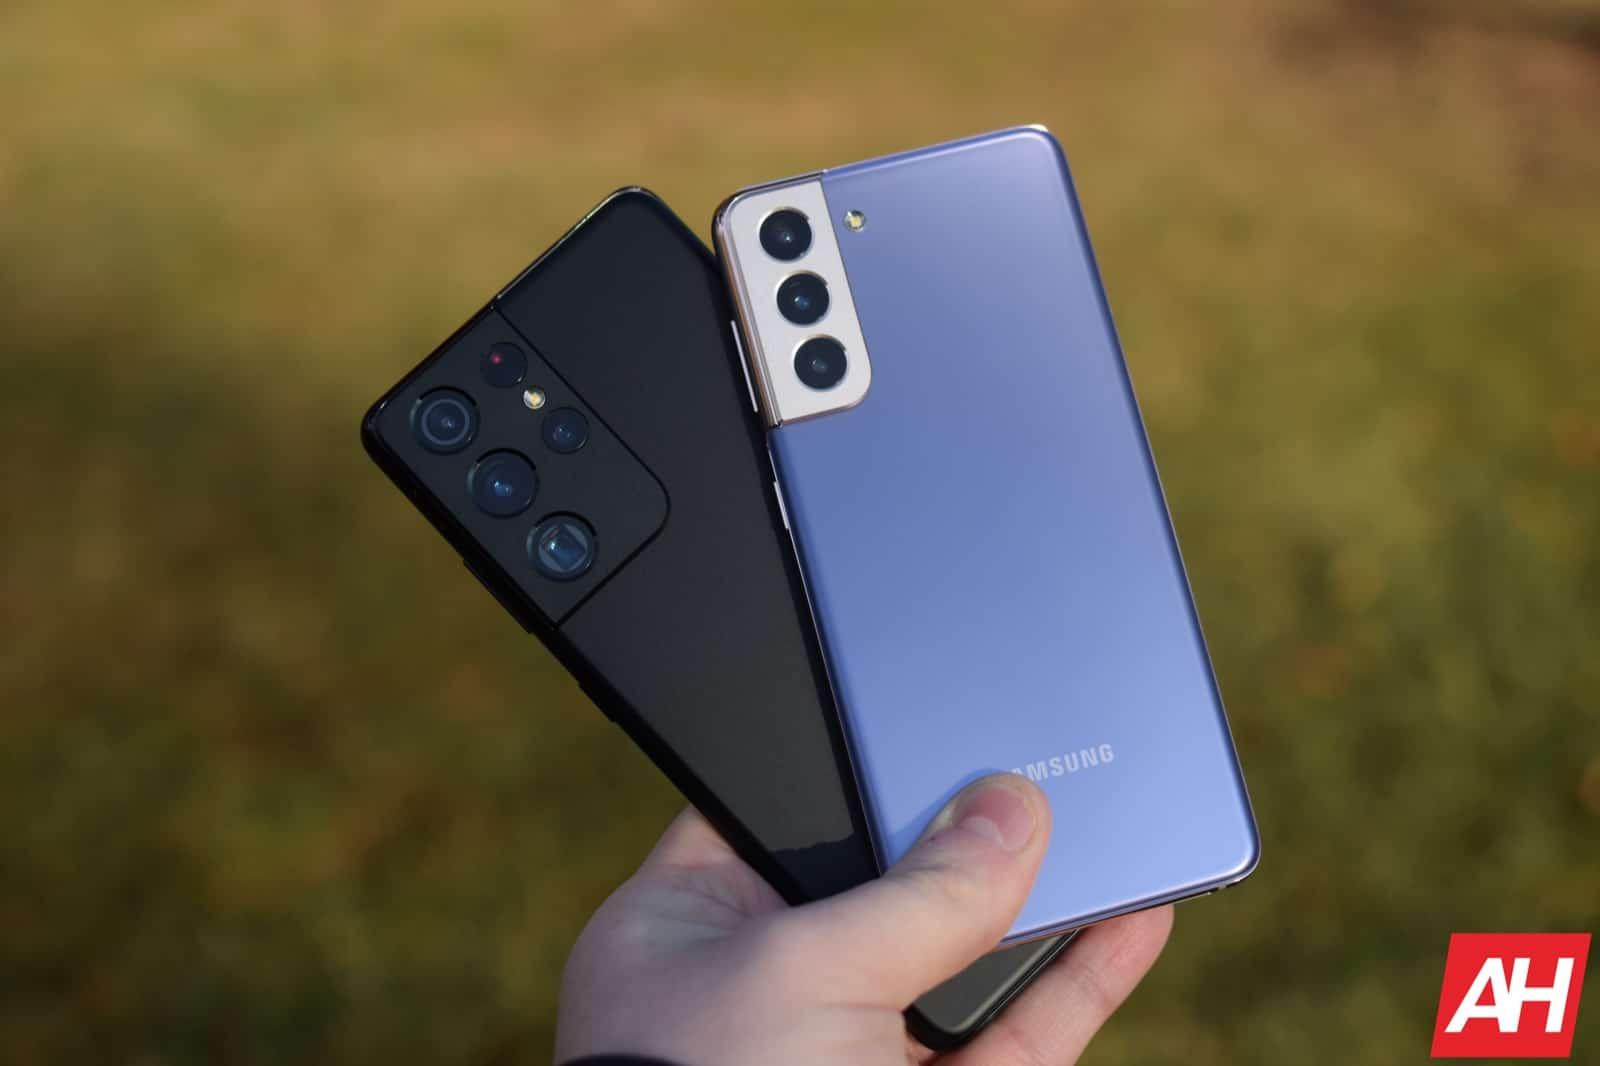 Phone Comparisons: Samsung Galaxy S21 vs S21+ vs S21 Ultra